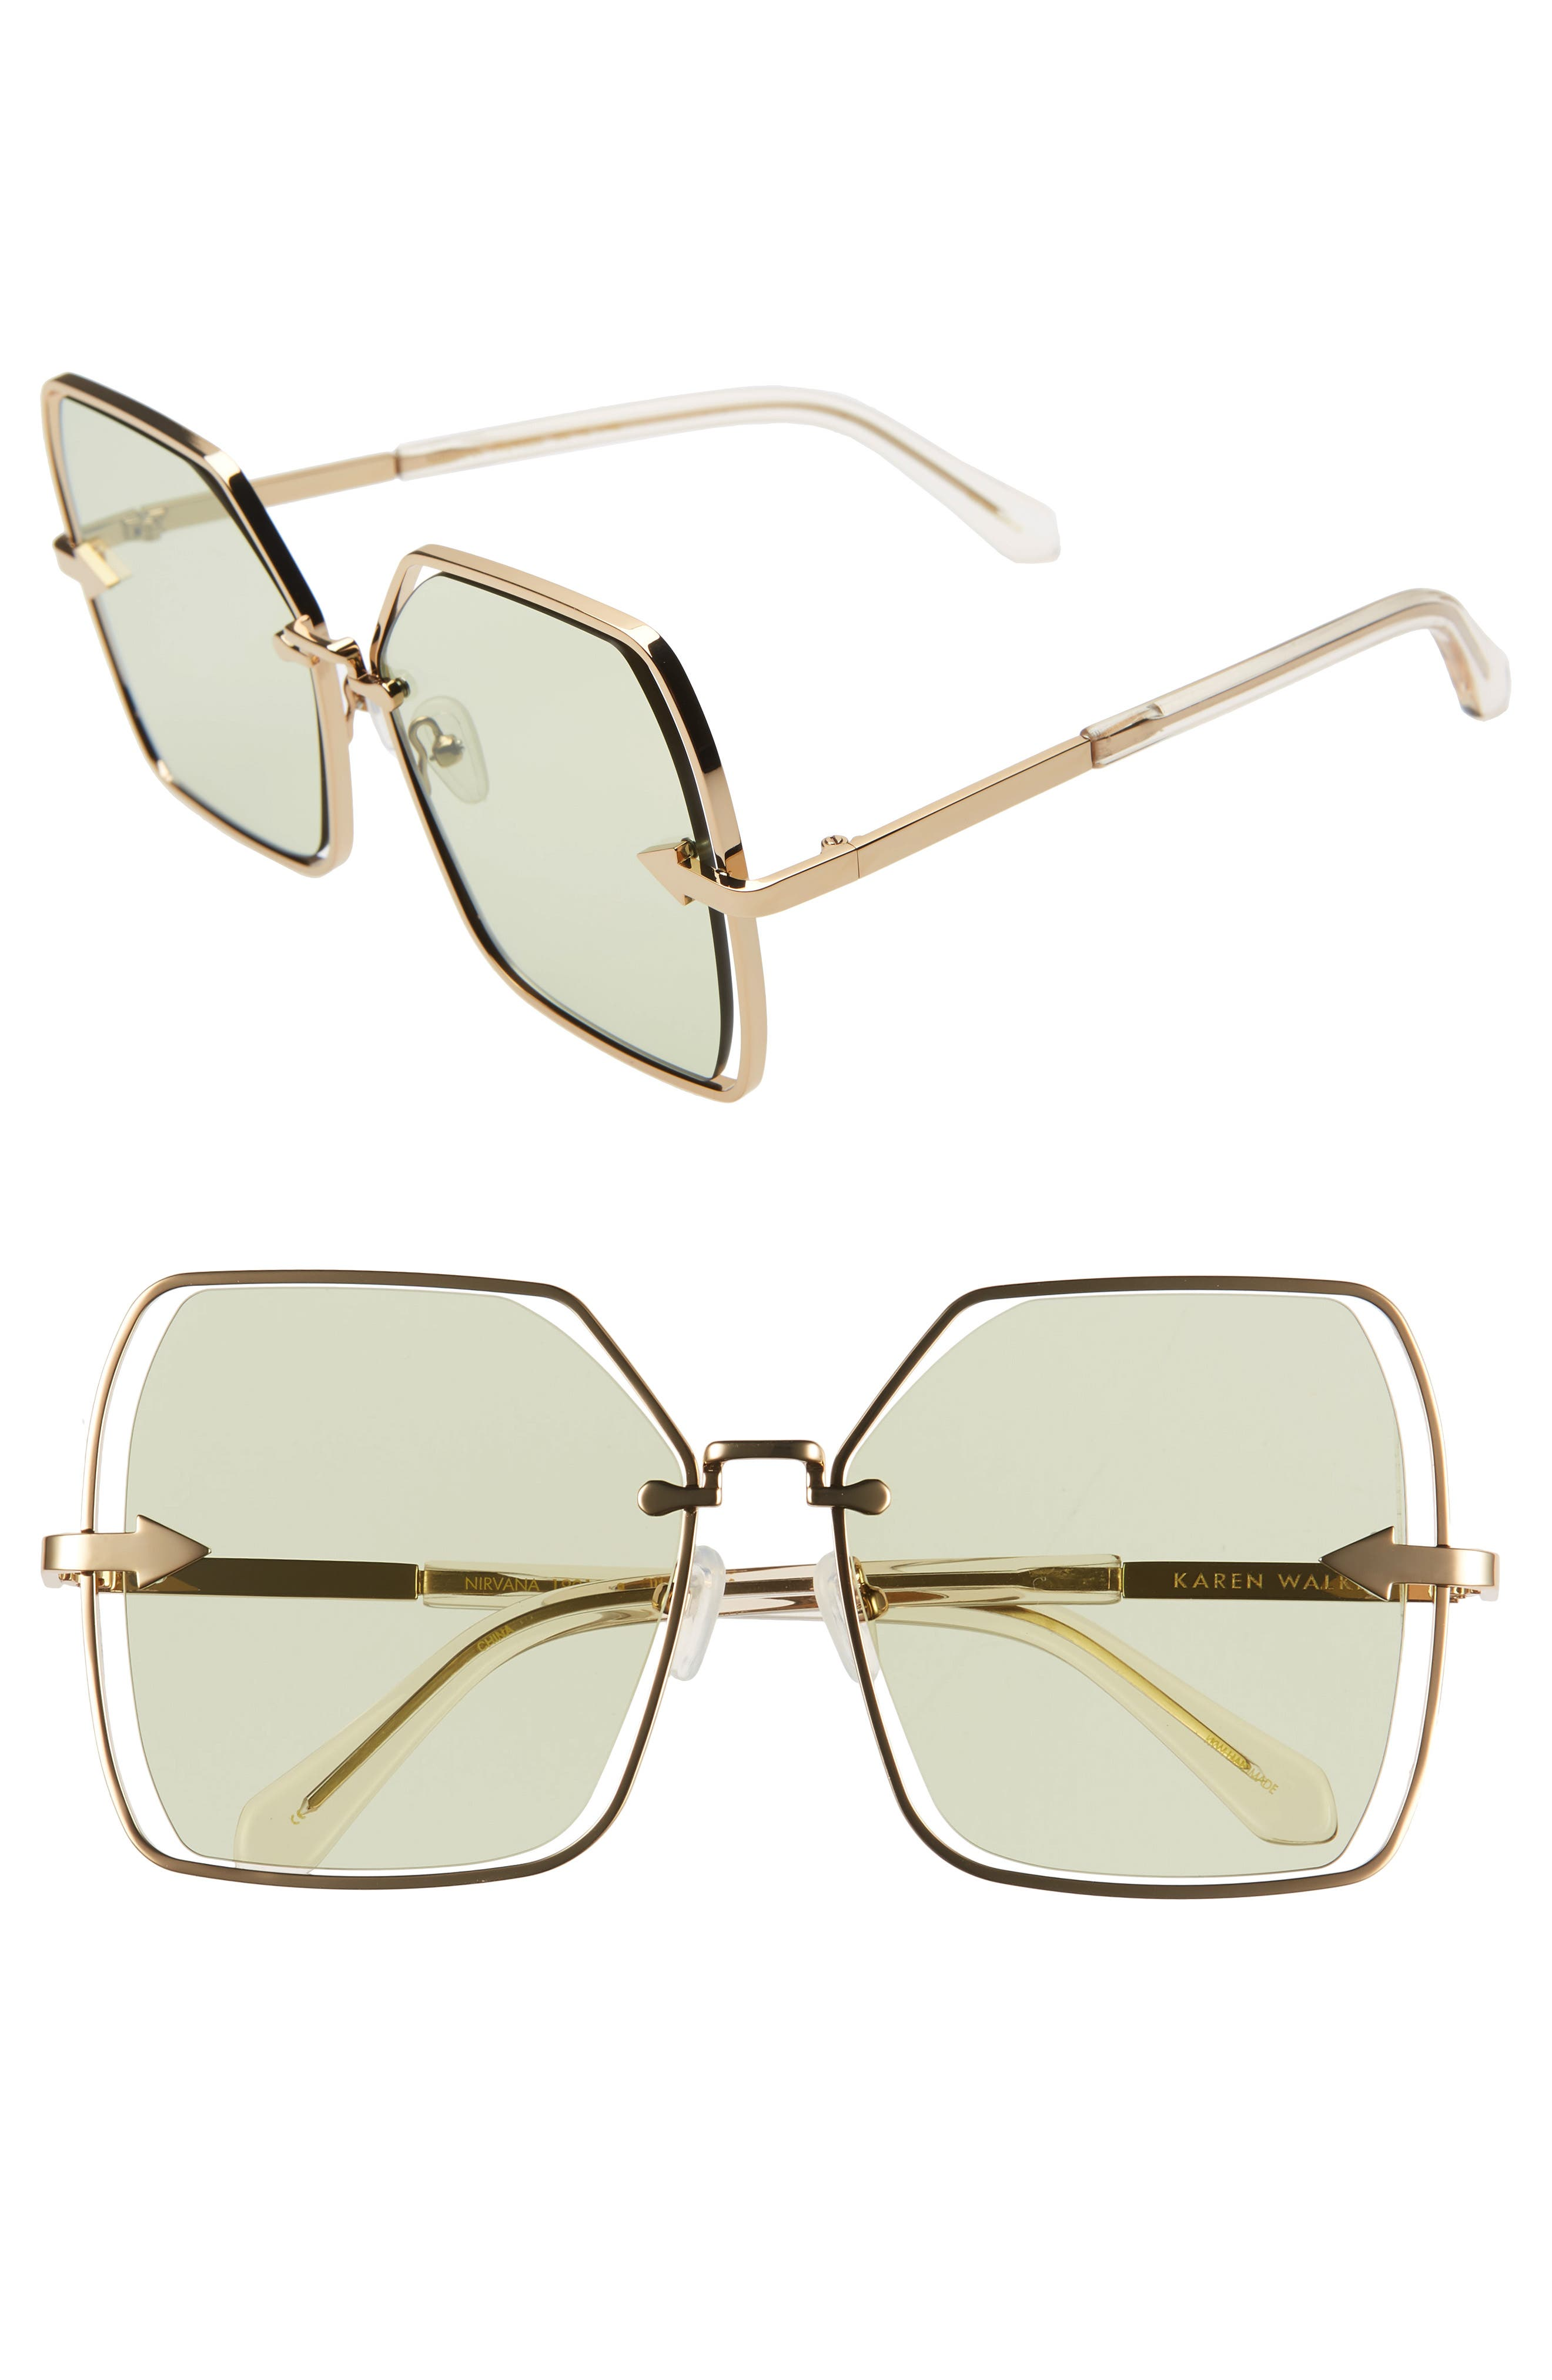 Karen Walker Sunglasses NIRVANA 58MM SQUARE BUTTERFLY SUNGLASSES - GOLD/ SAGE TINT